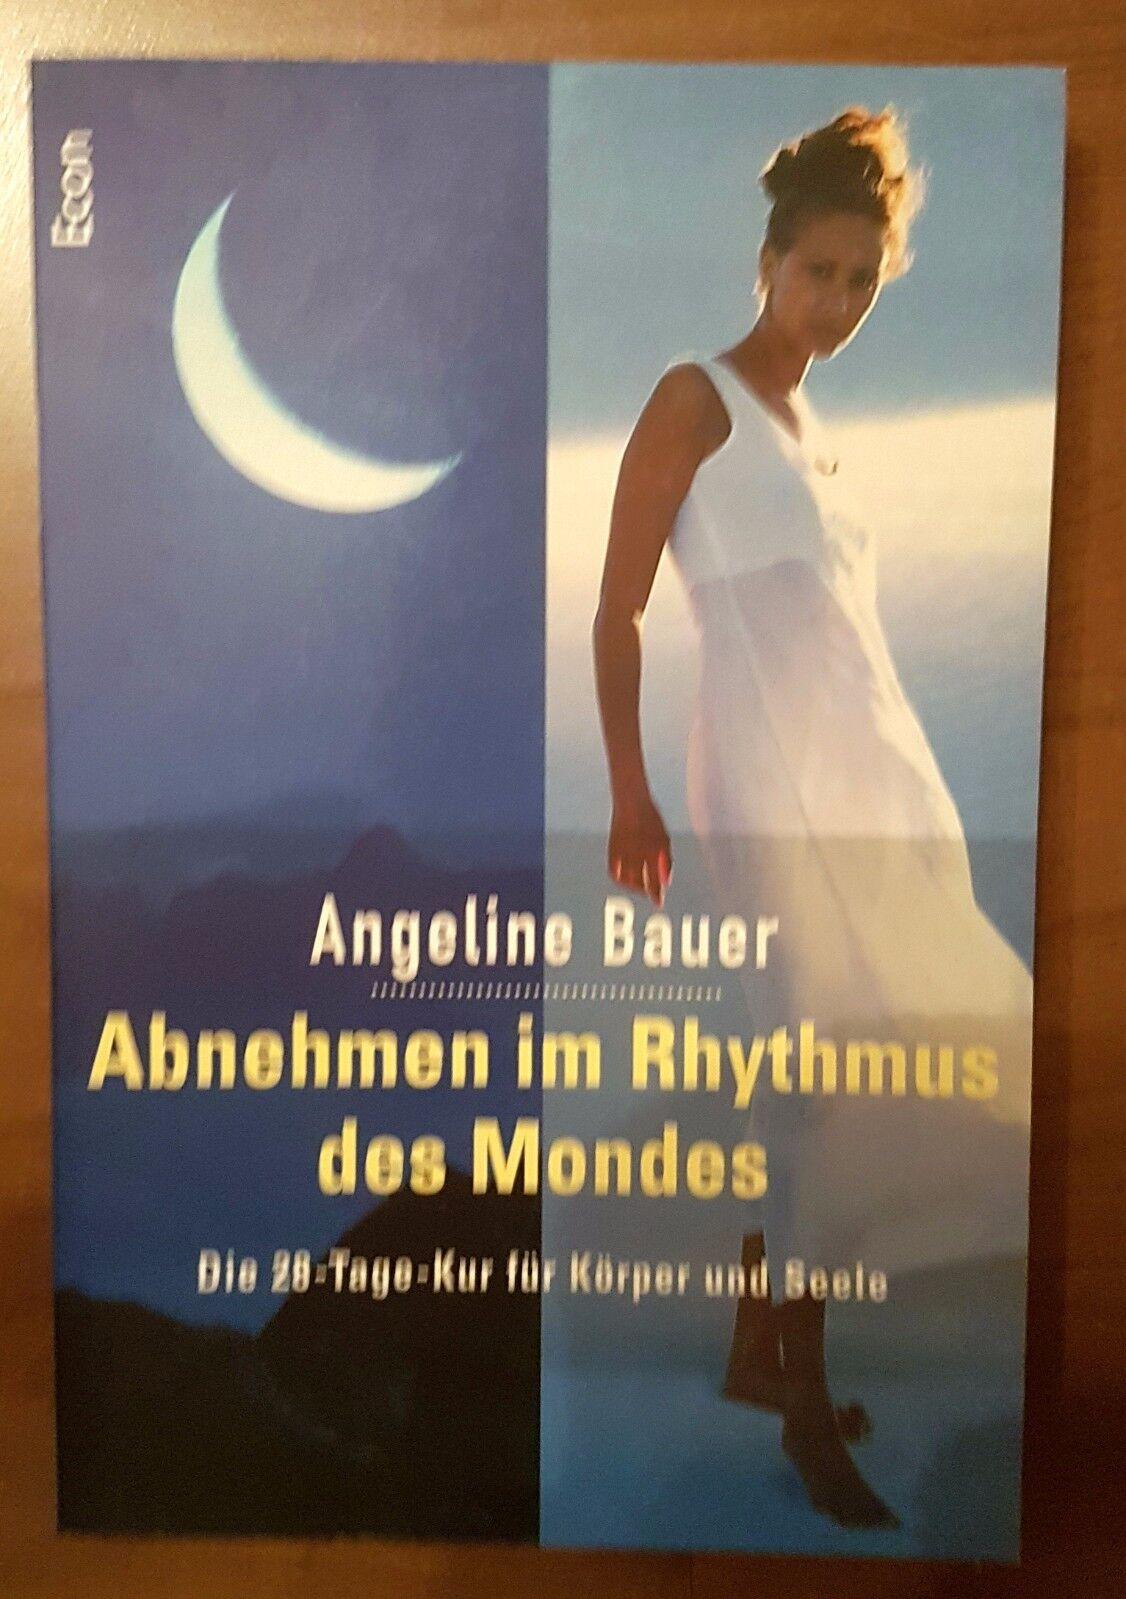 ### ABNEHMEN IM RYTHMUS DES MONDES 28-Tage-Kur ###